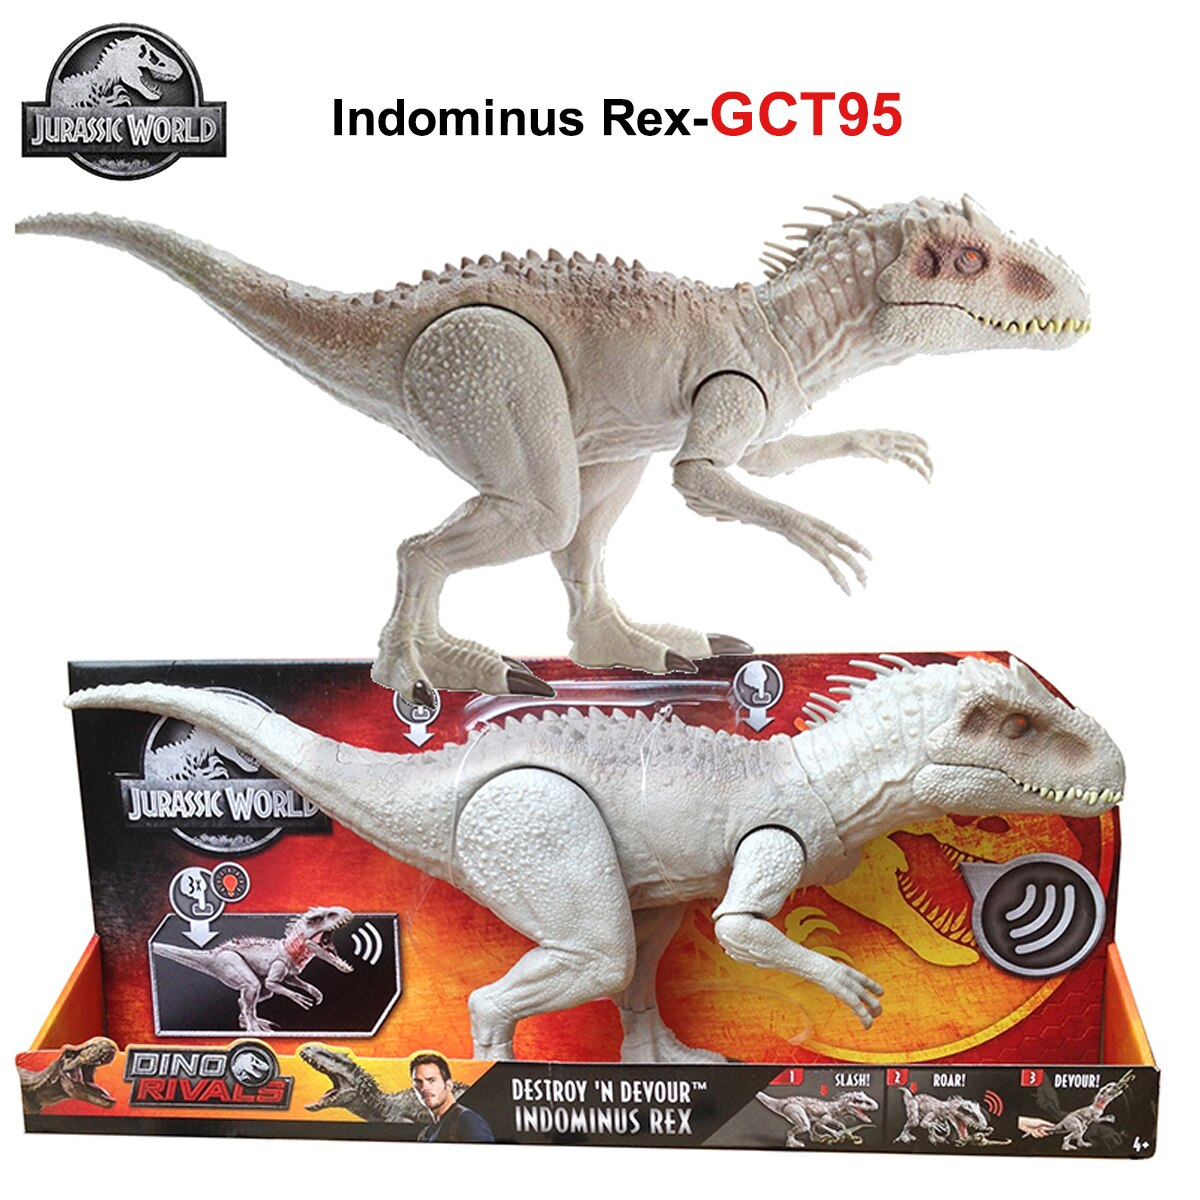 Jurassic World Indominus Rex GCT95 Dinosaur Toy Tyrannosaurus Biting Movement Ferocious Sound Effect Toys for Kids Birthday Gift